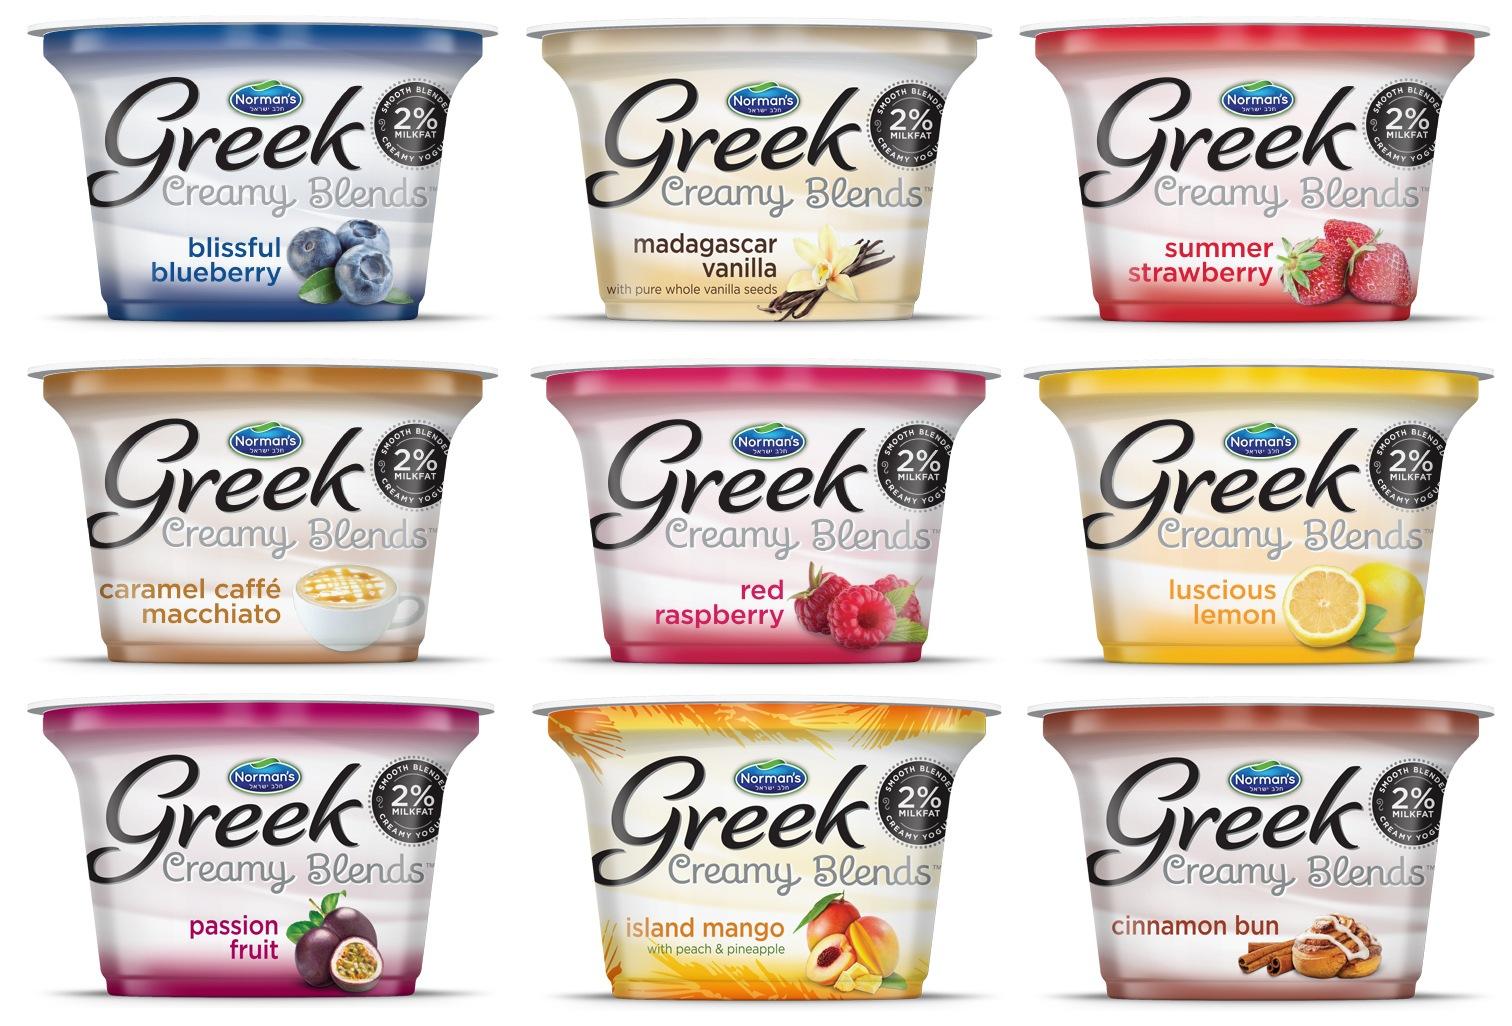 Normans Creamy Blends Yogurt Branding